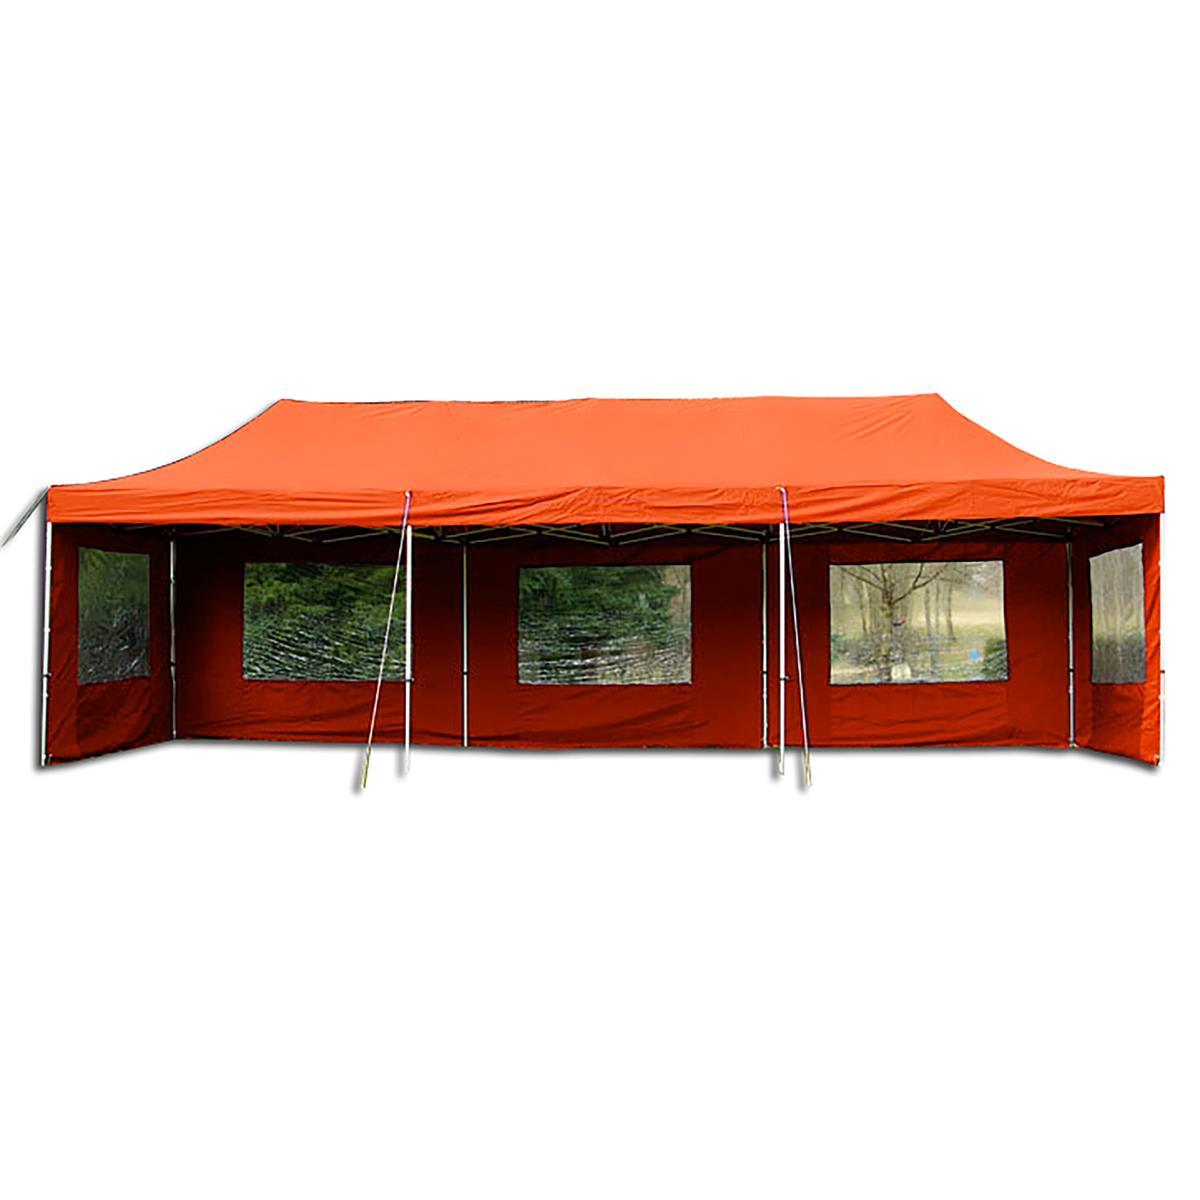 PROFI Faltpavillon 3x9 m terracotta mit Seitenteilen wasserdichtes Dach Zelt